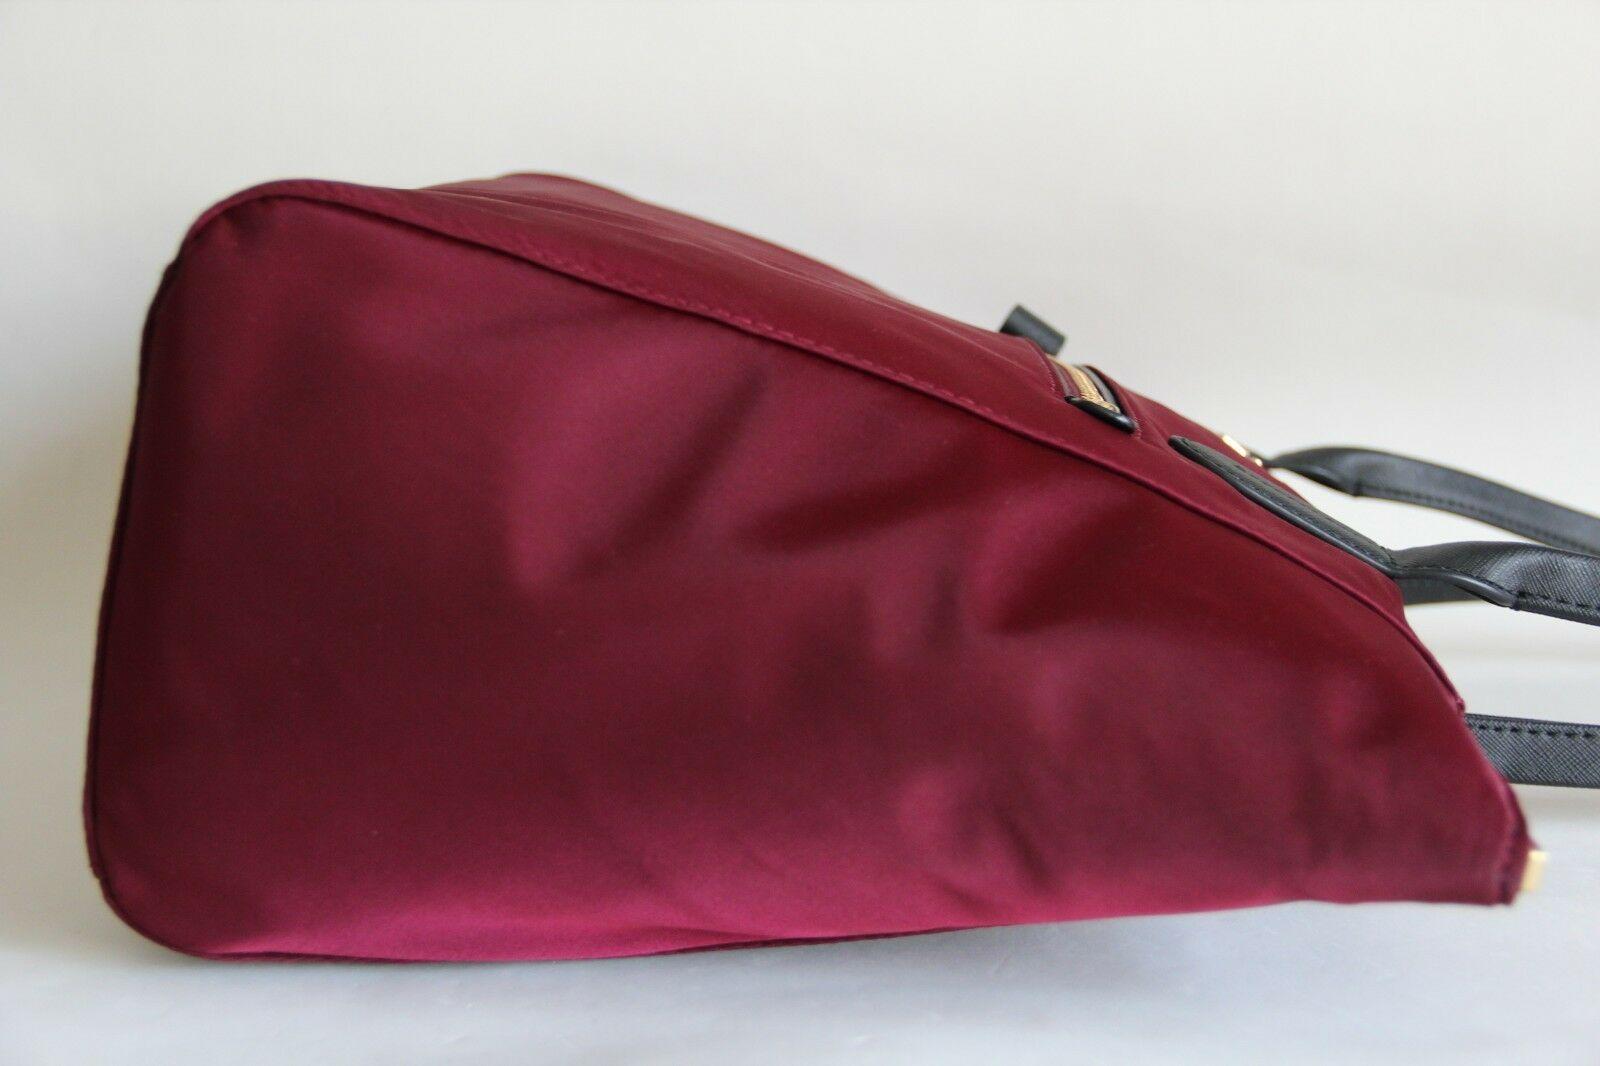 aeab76e201a4 Nwt Michael Kors Kelsey Top Zip Large Nylon and 50 similar items